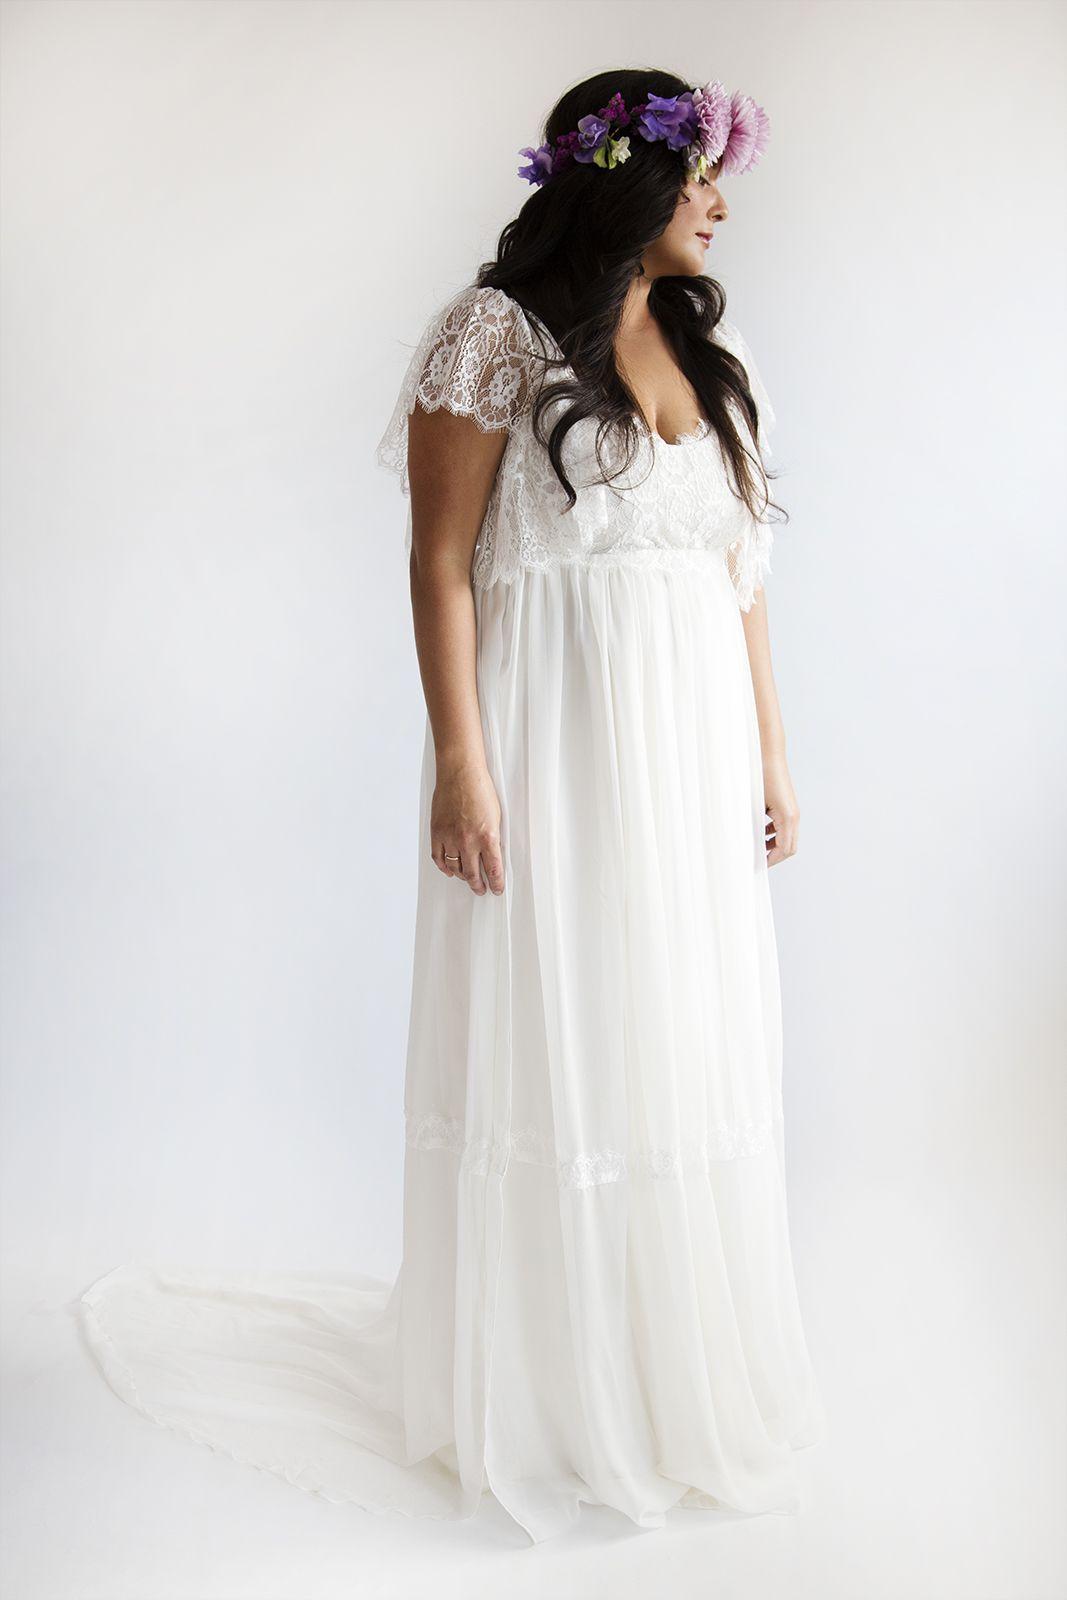 17 Barnyard Wedding Dresses To Inspire Any Bride Interestinginformations Com Wedding Dresses Wedding Dresses Lace Casual Wedding Dress [ 1600 x 1067 Pixel ]